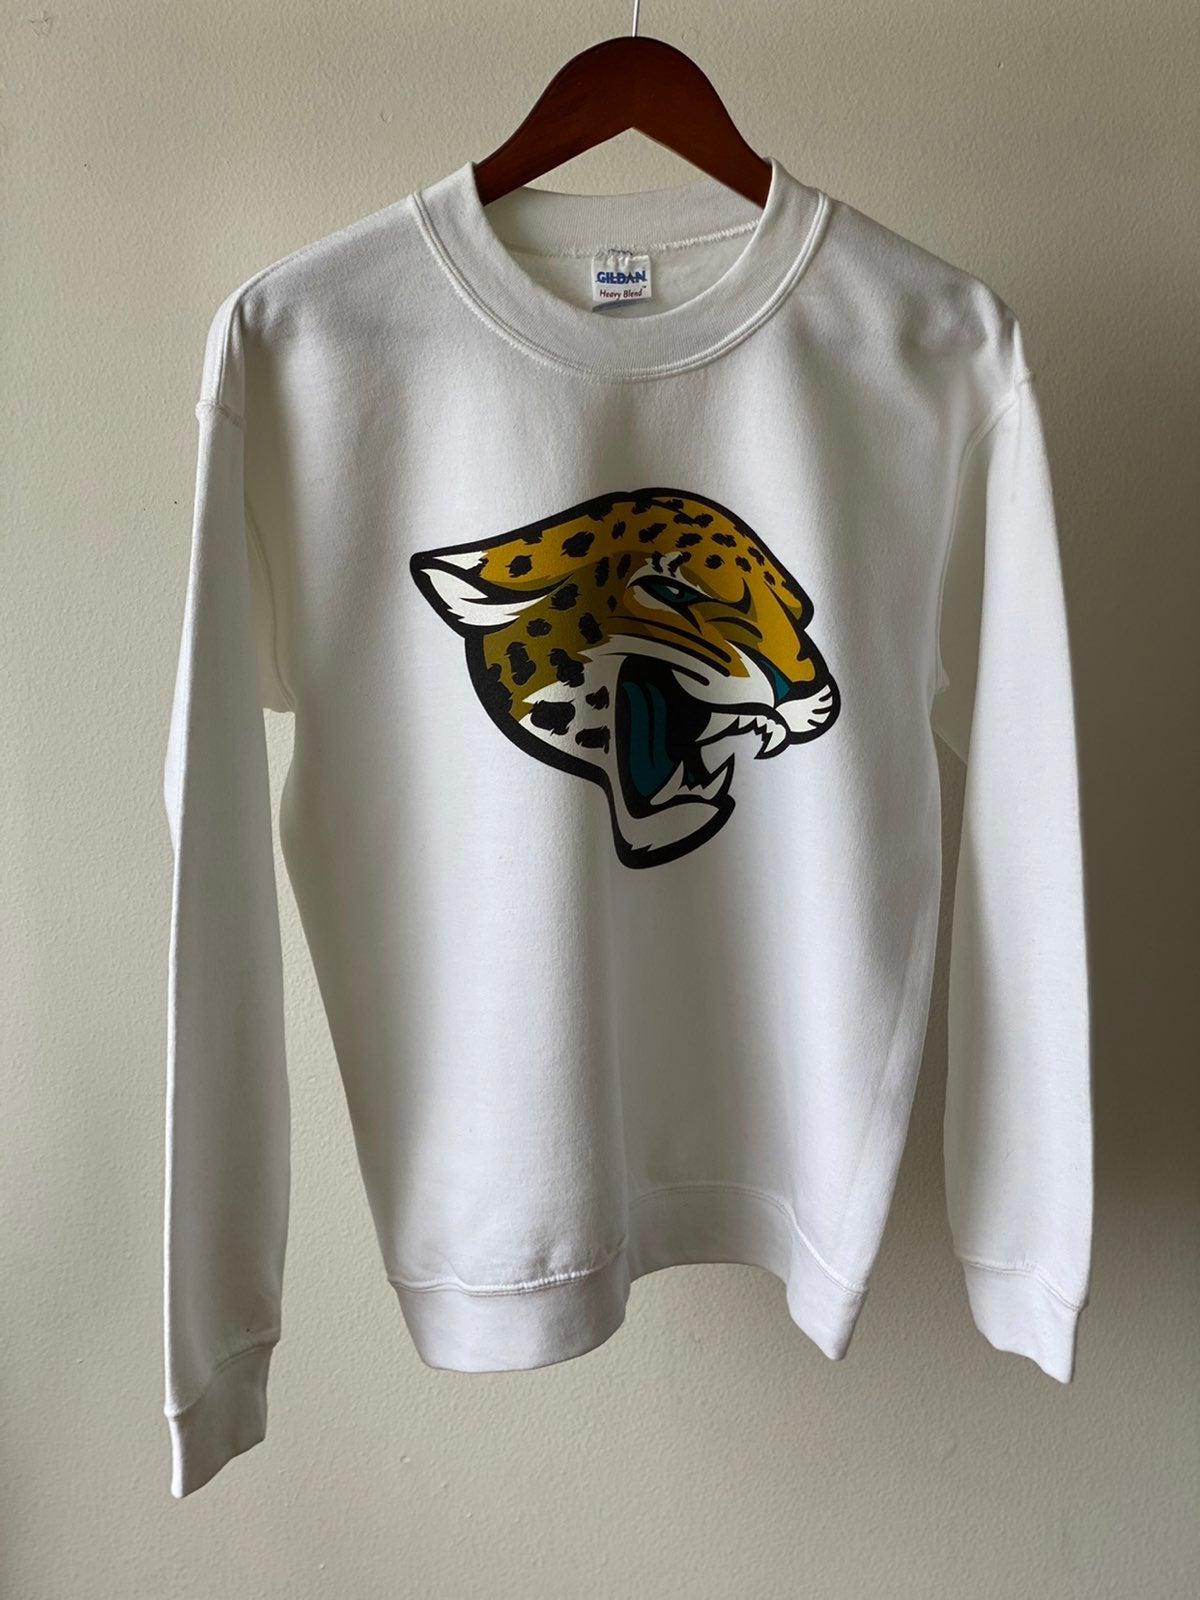 Jacksonville Jaguars Crewneck